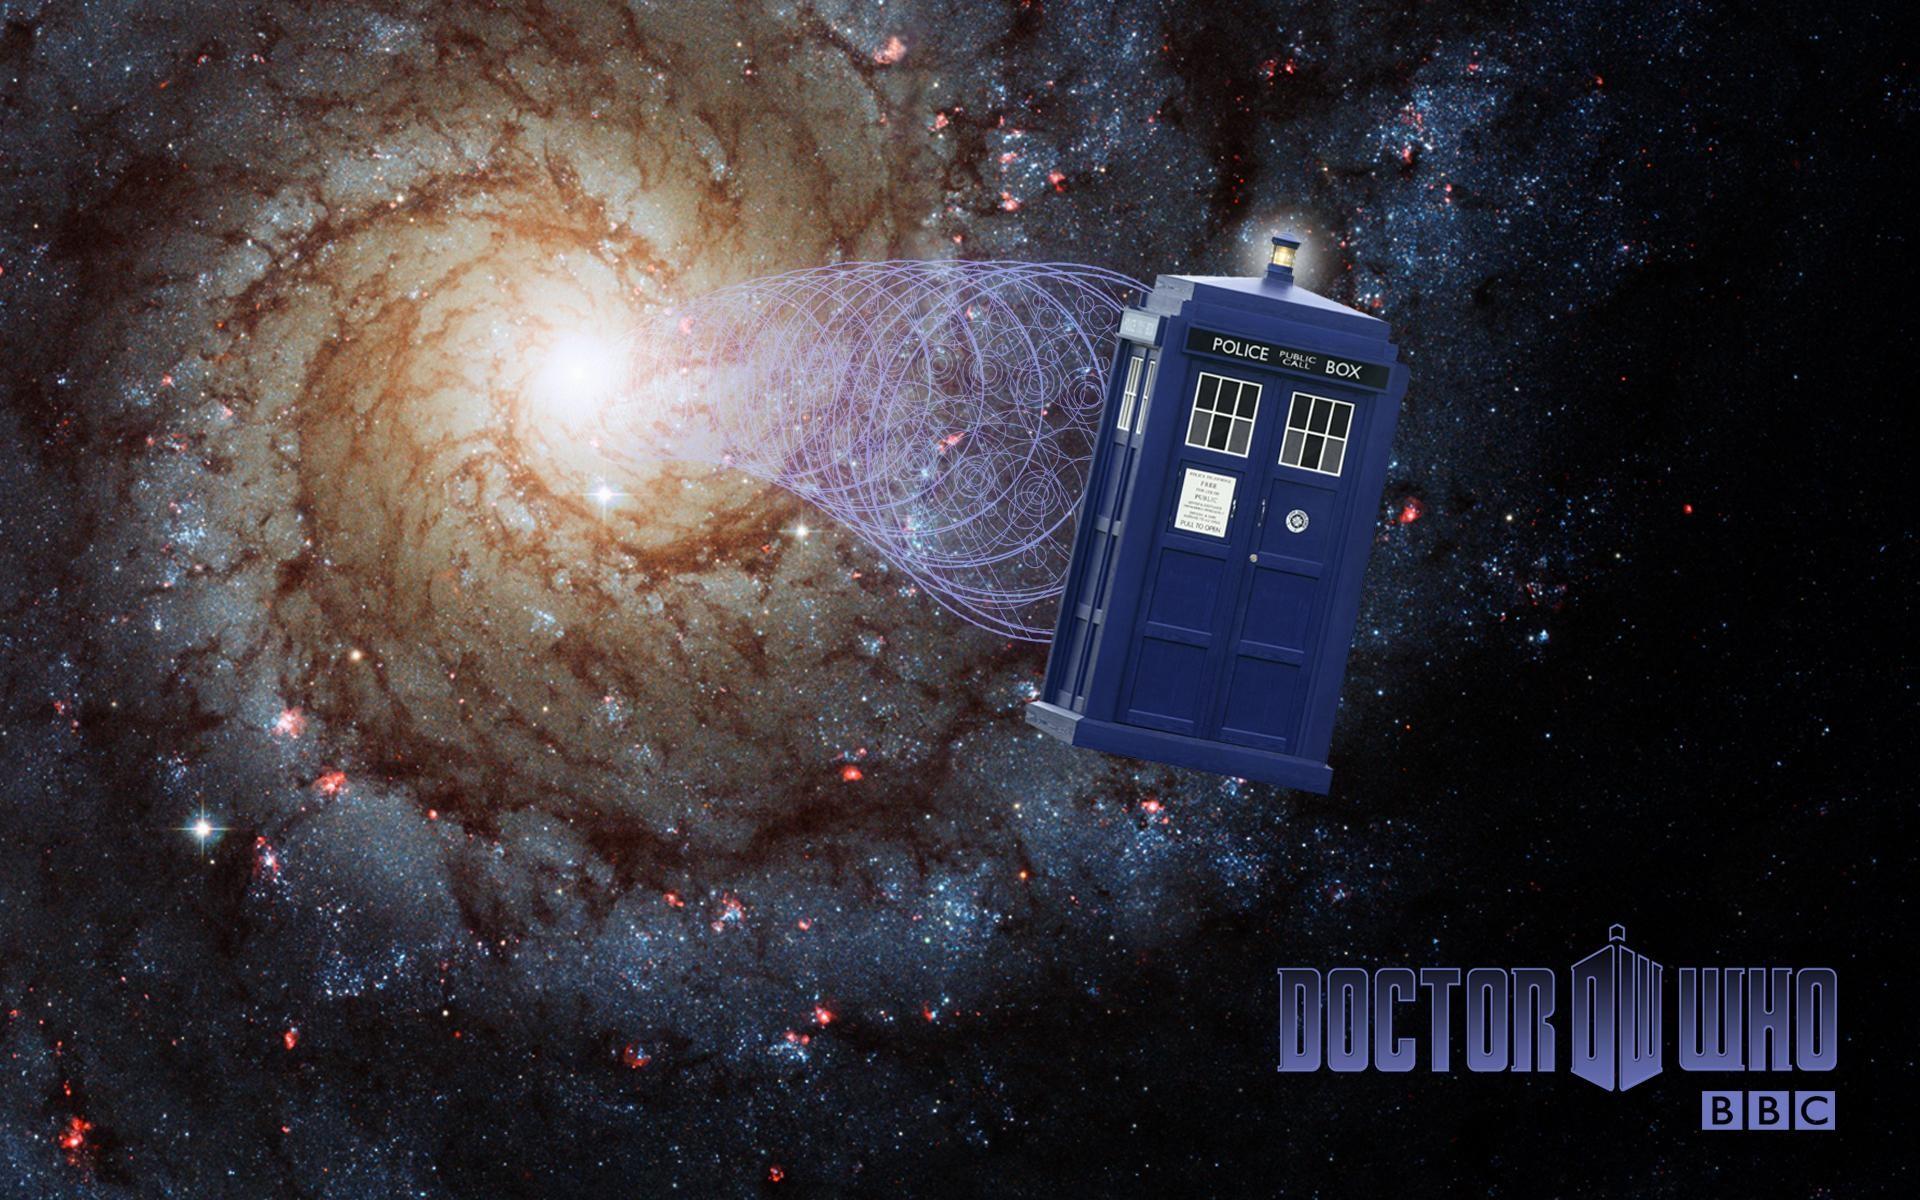 Doctor-Who-Wallpapers-Tardis